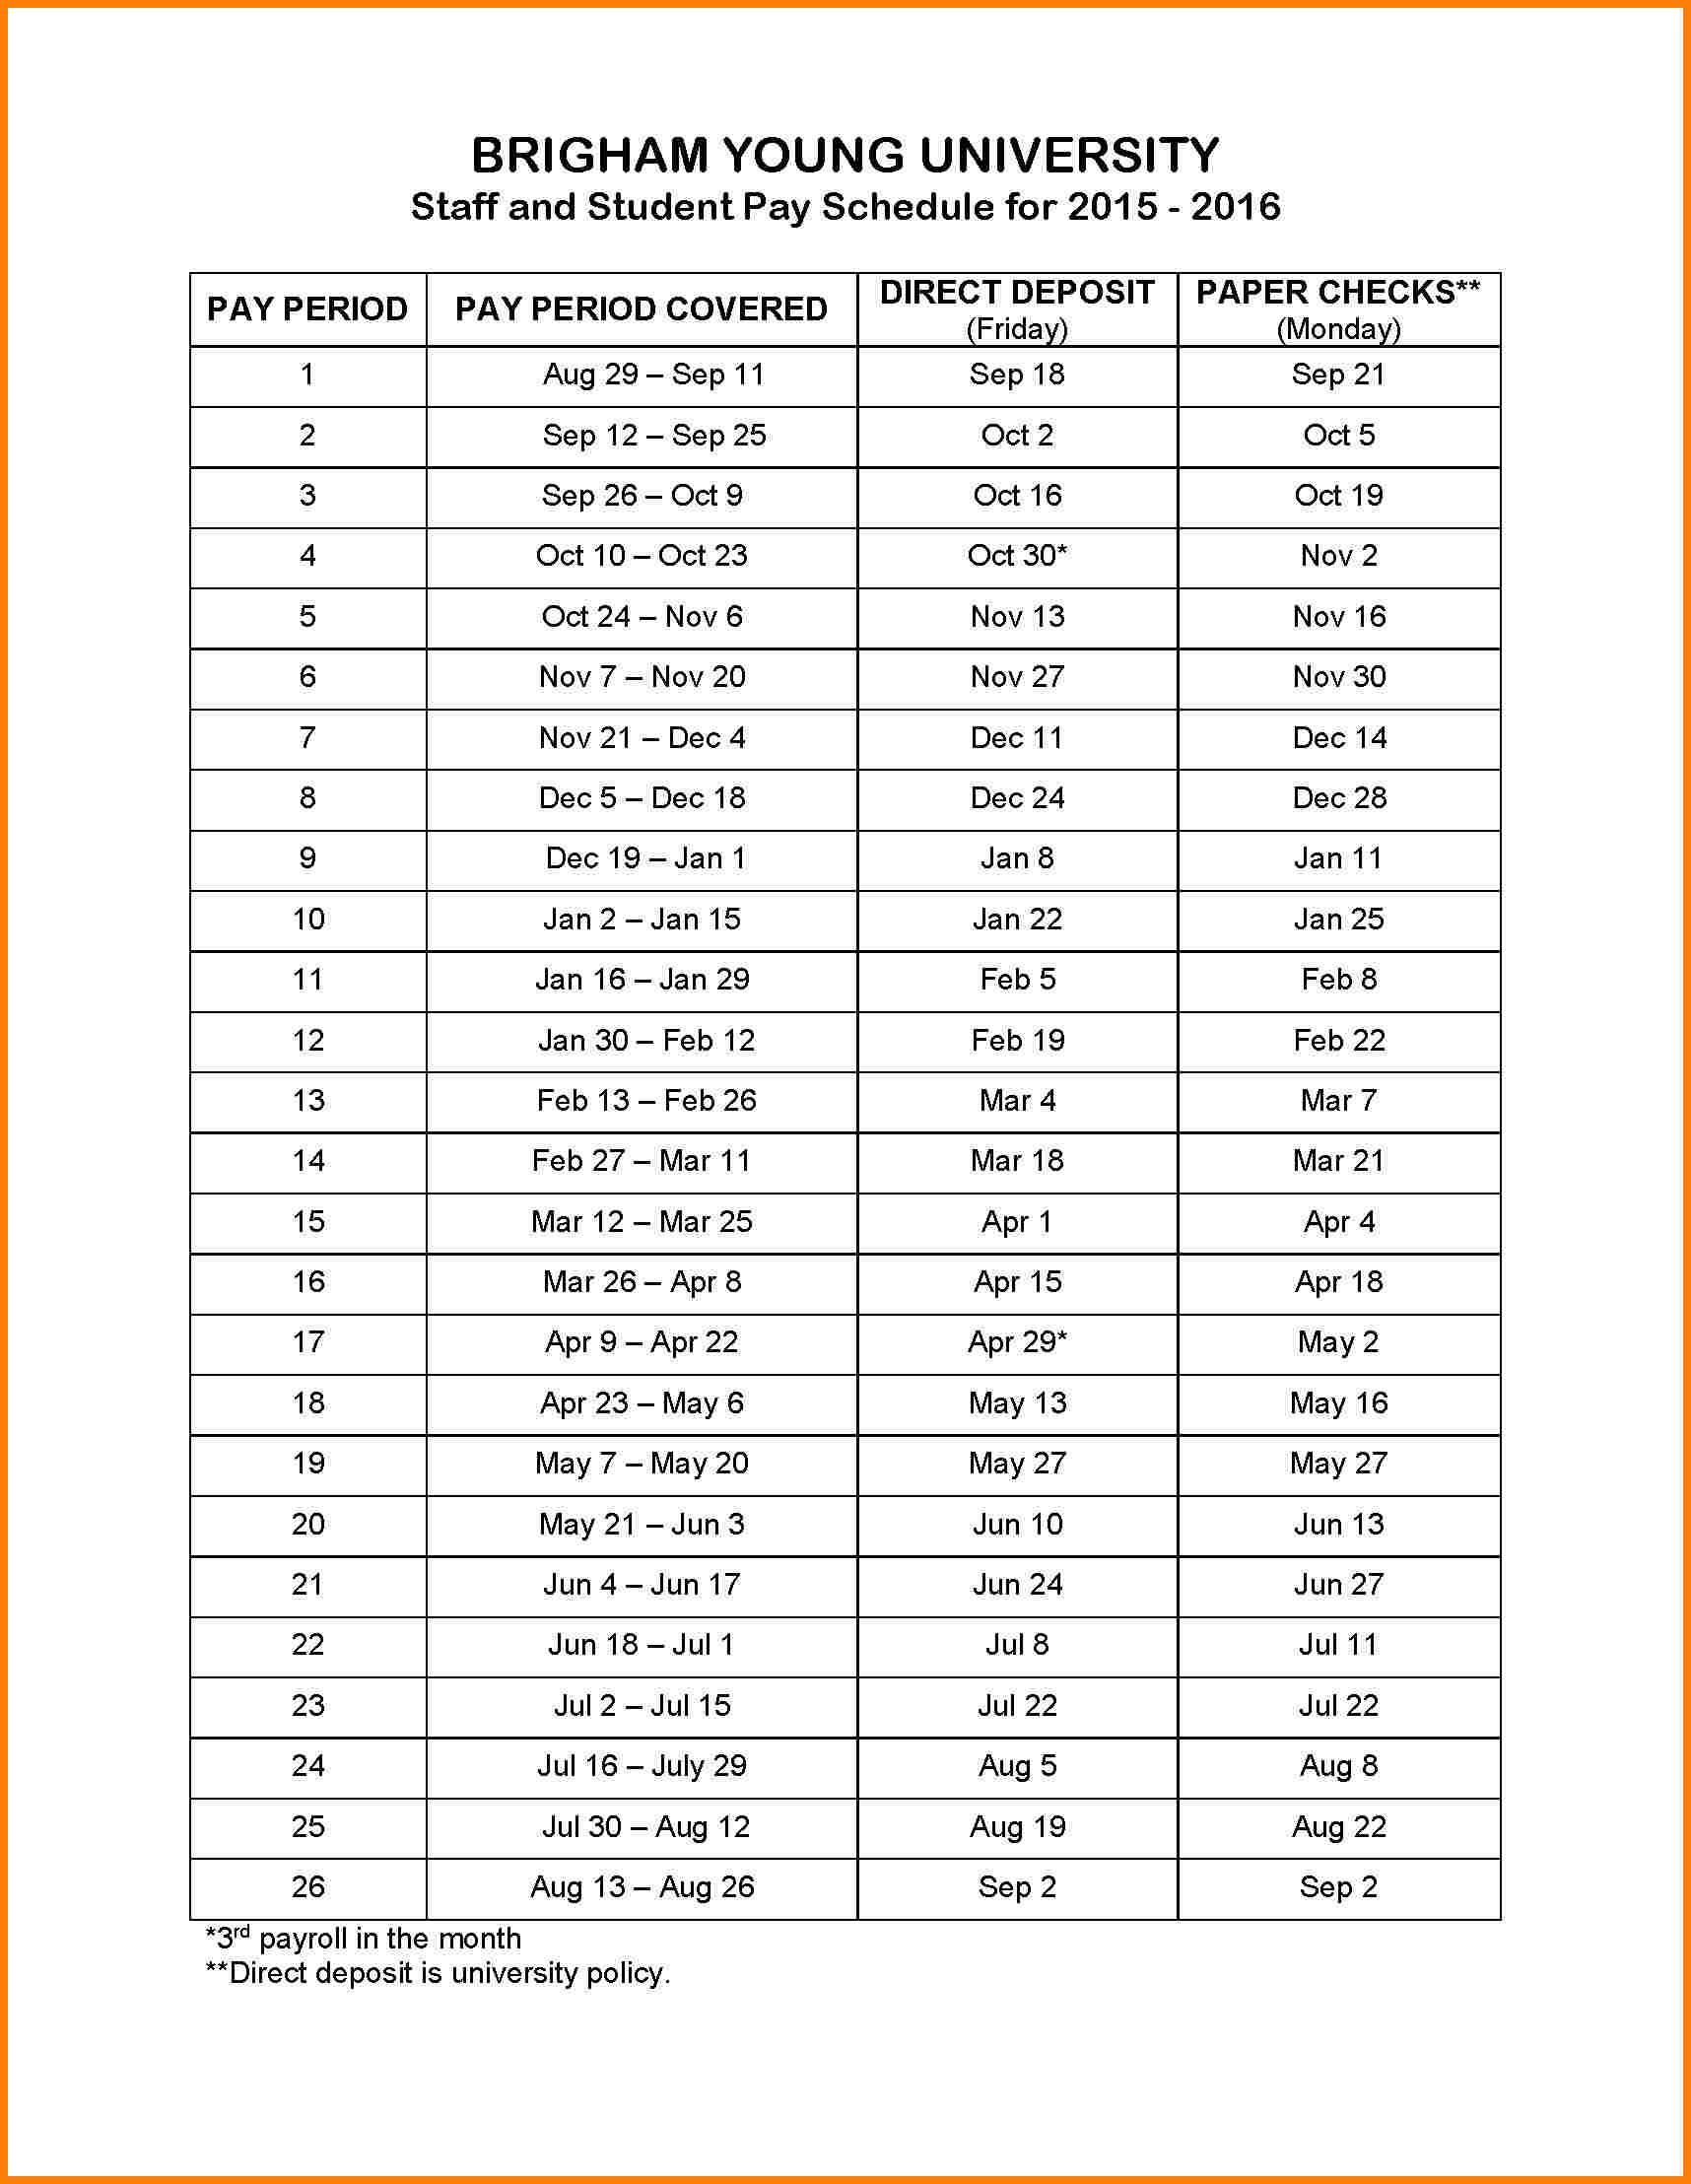 Biweekly Payroll Calendar 2015 Template Biweekly Pay Schedule with Biweekly Payroll Schedule Template